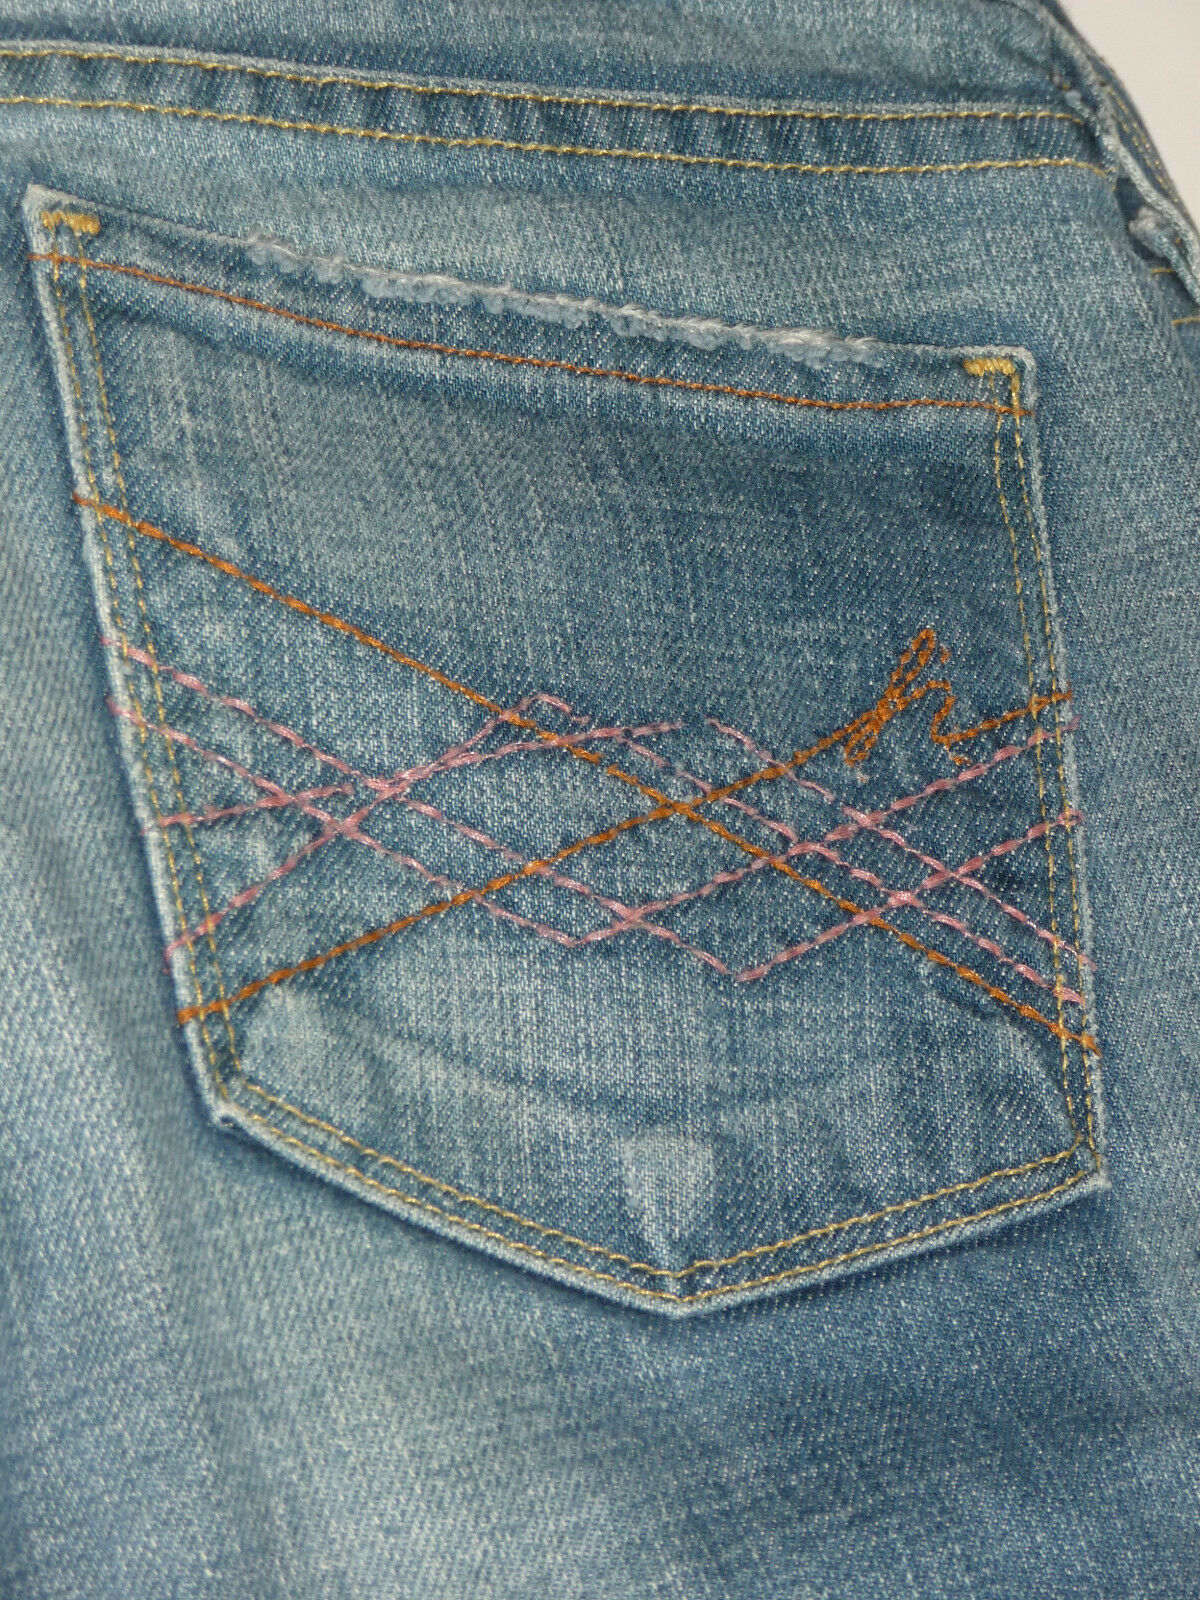 EUC Citizens of Humanity Naomi Low Waist Flare Light Cordoba Jeans 29 x29